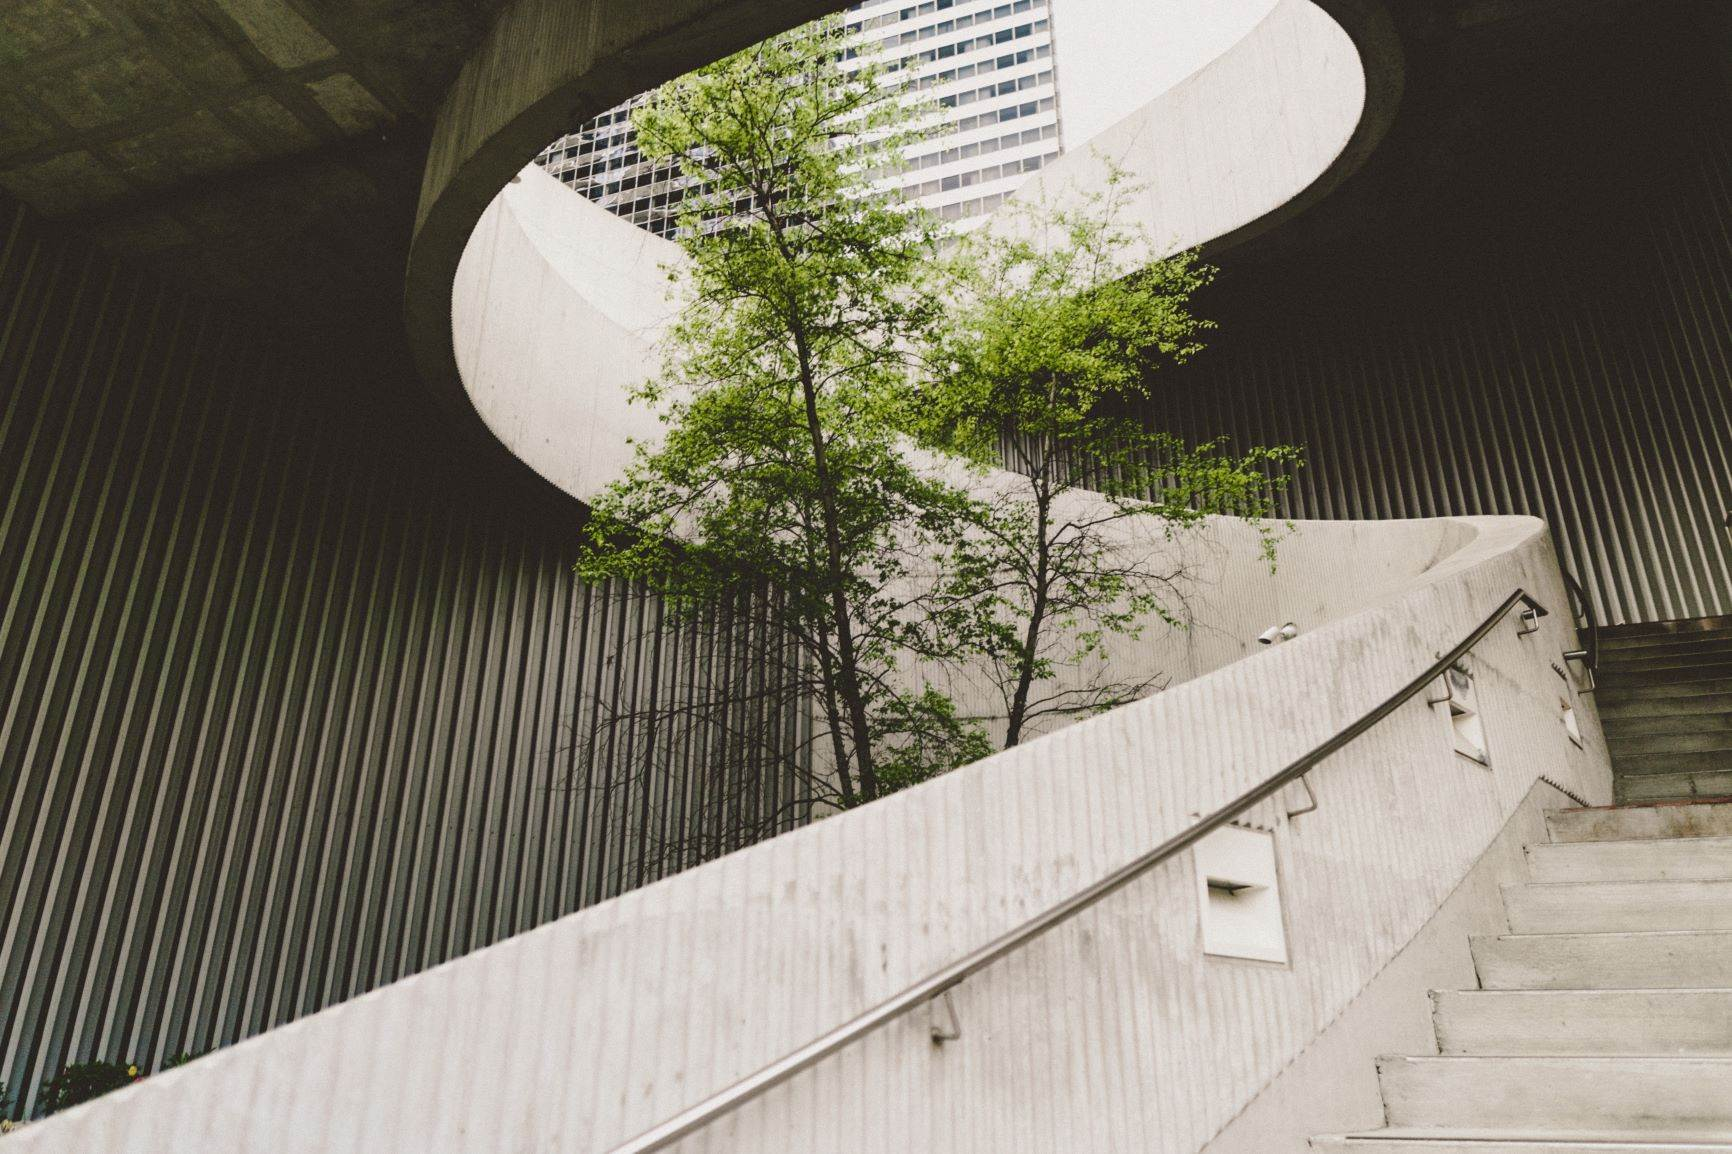 Trees beyond concrete